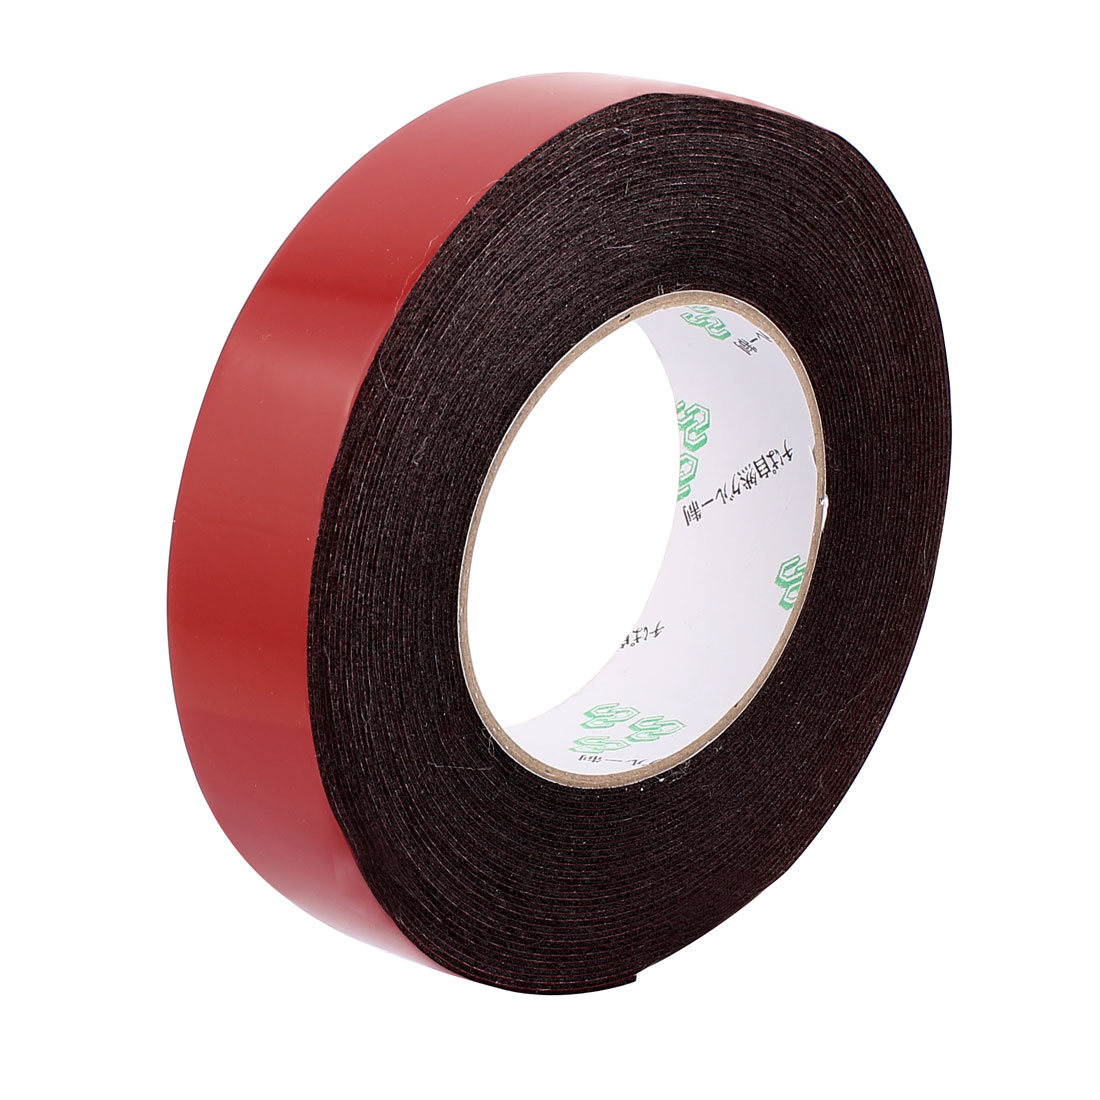 30mmx1mm Double Sided Sponge Tape Adhesive Sticker Foam Glue Strip Sealing 10 Meters 33Ft